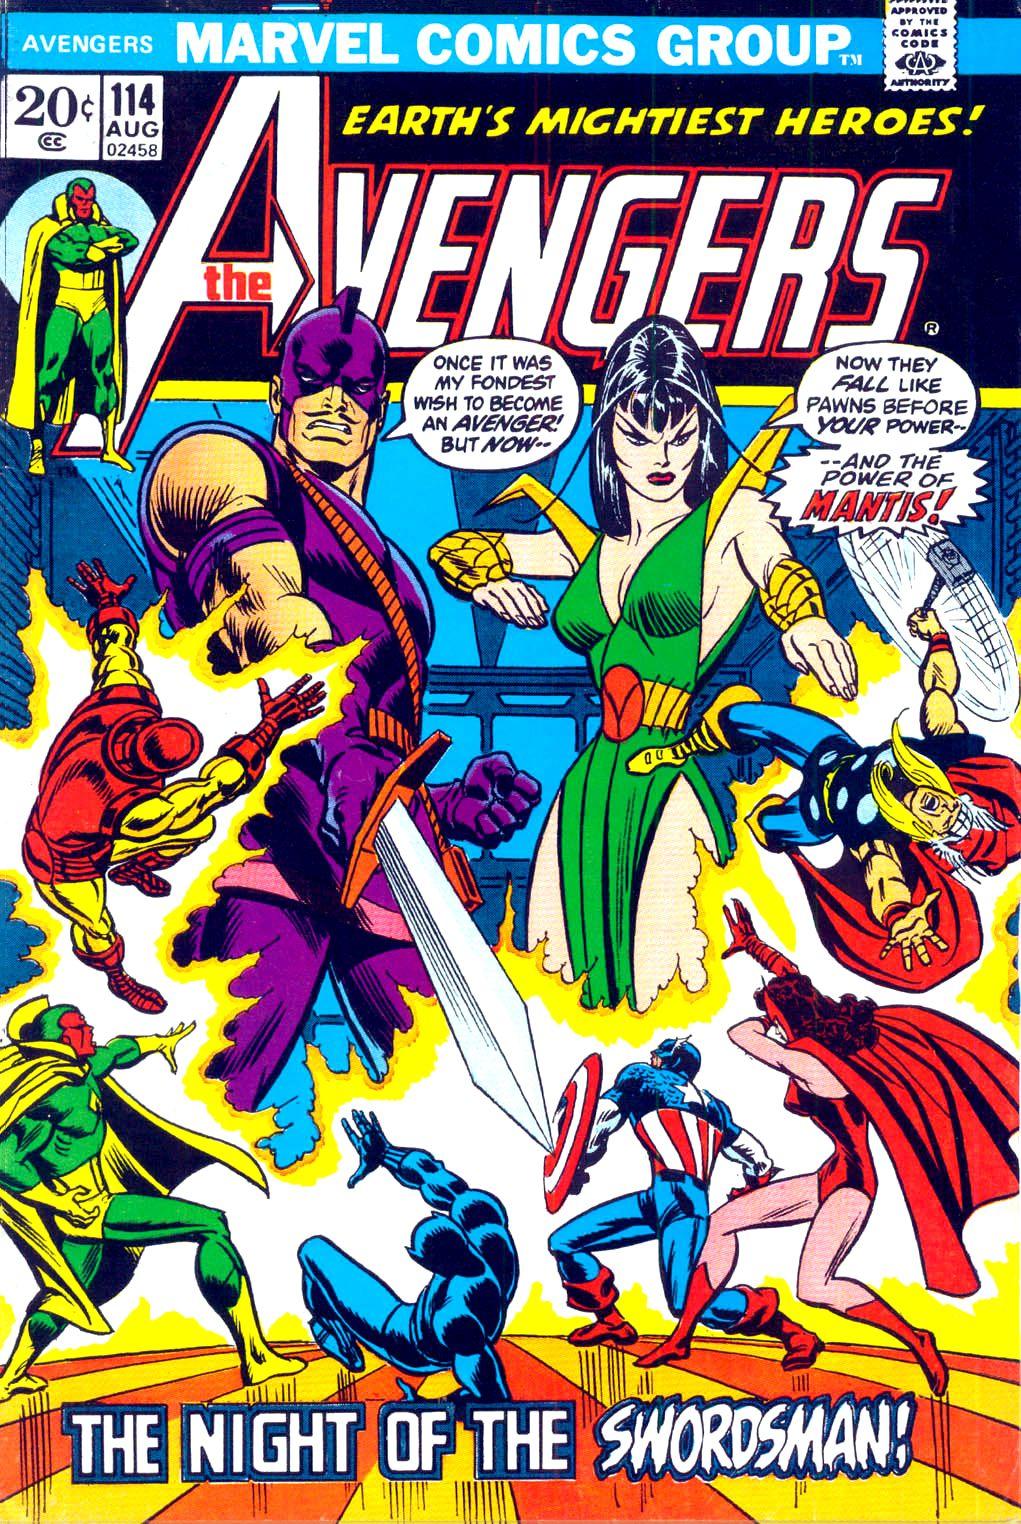 Avengers 114 marvel comic books marvel comics covers